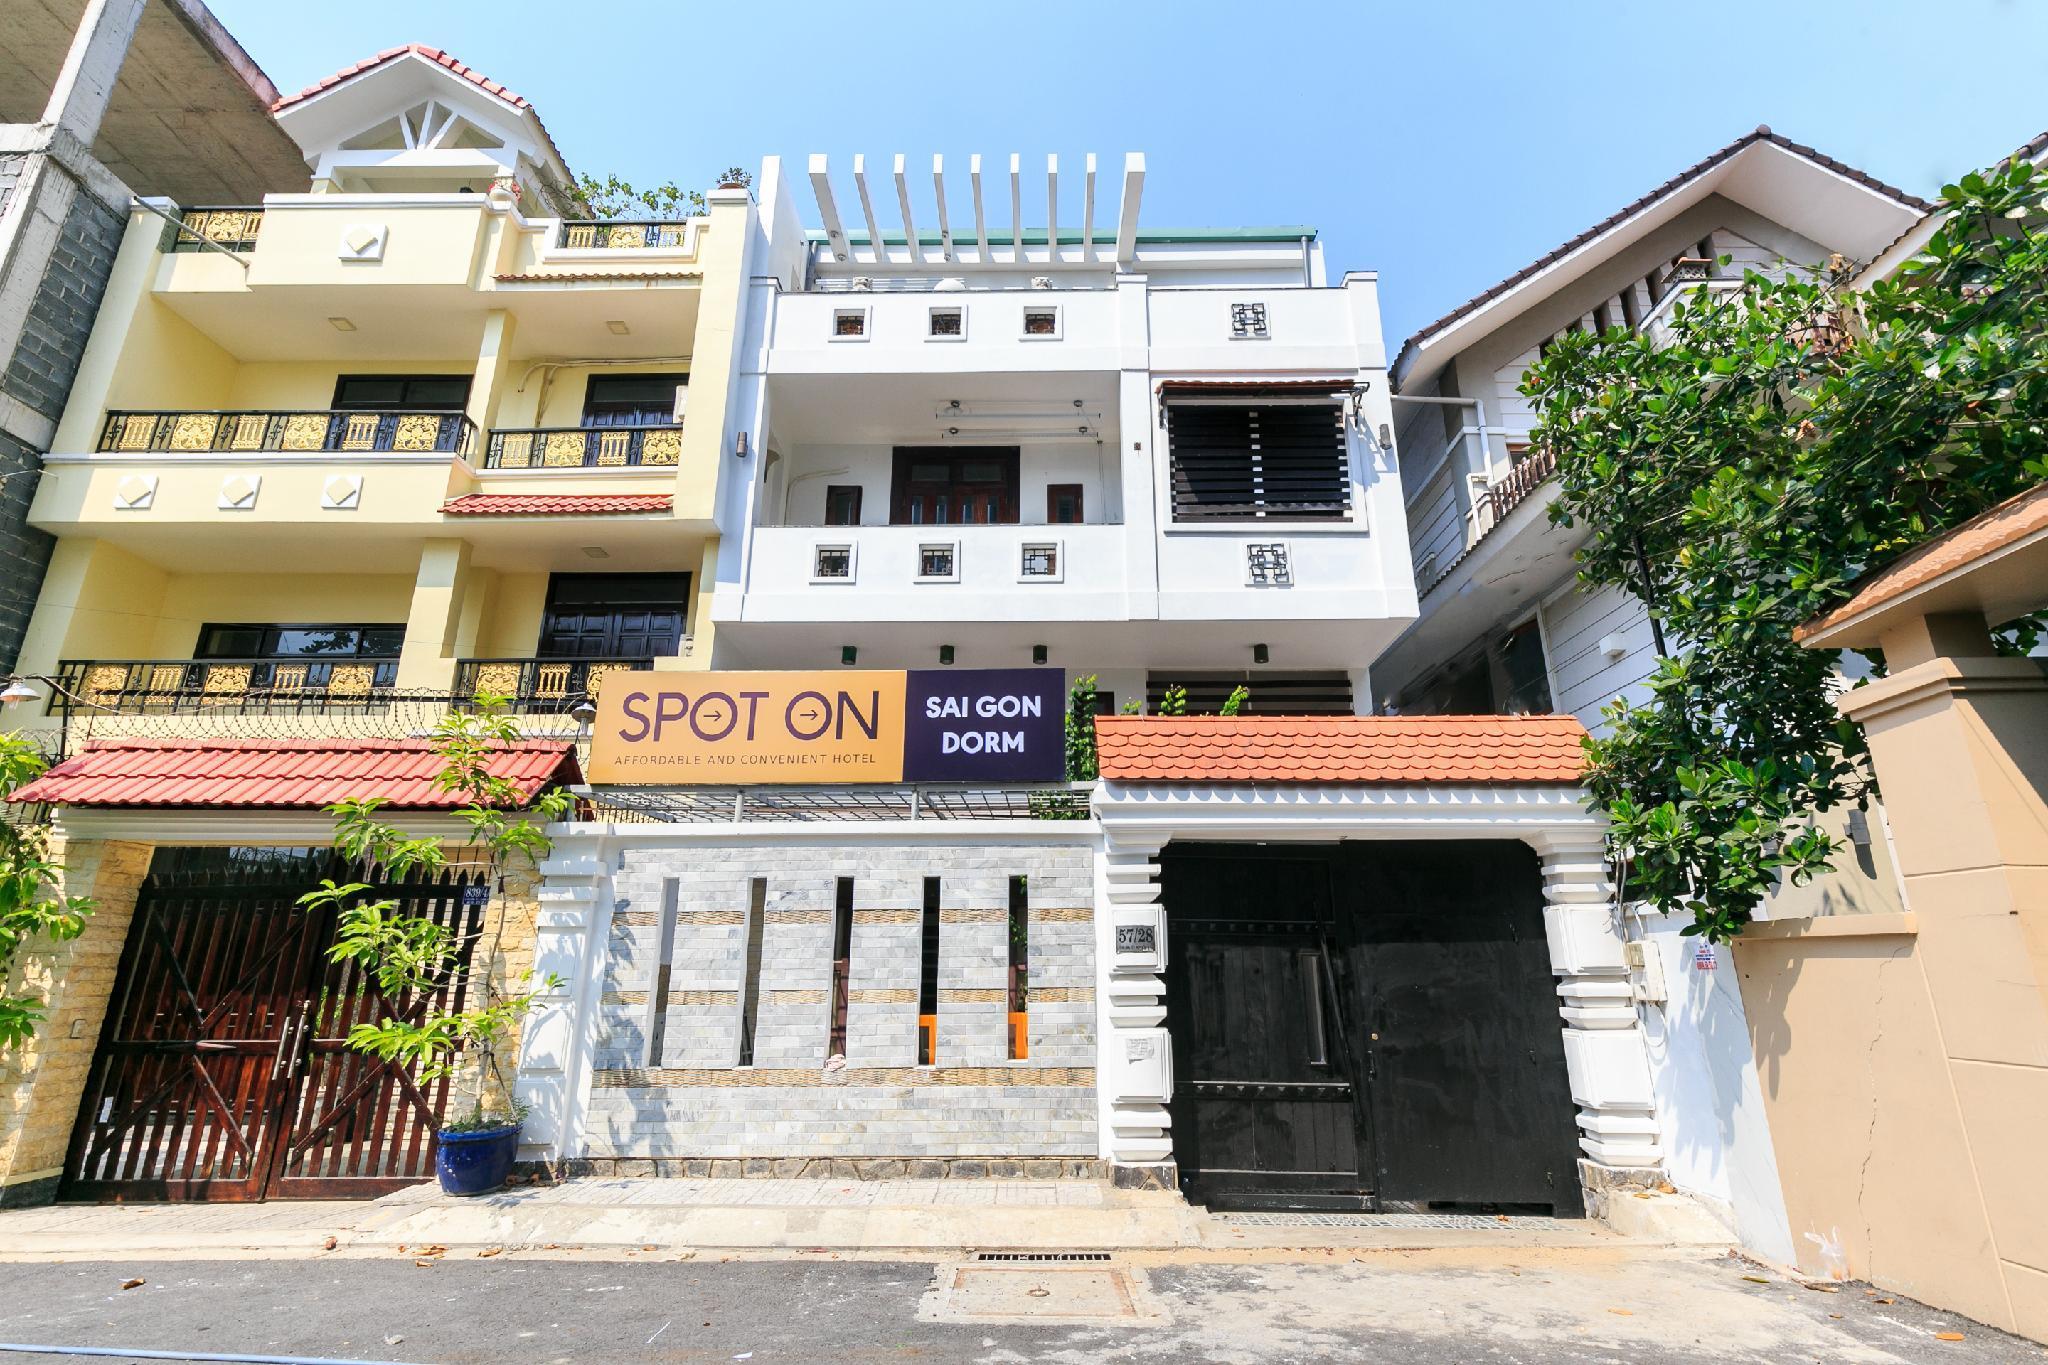 SPOT ON 695 Sai Gon Dorm